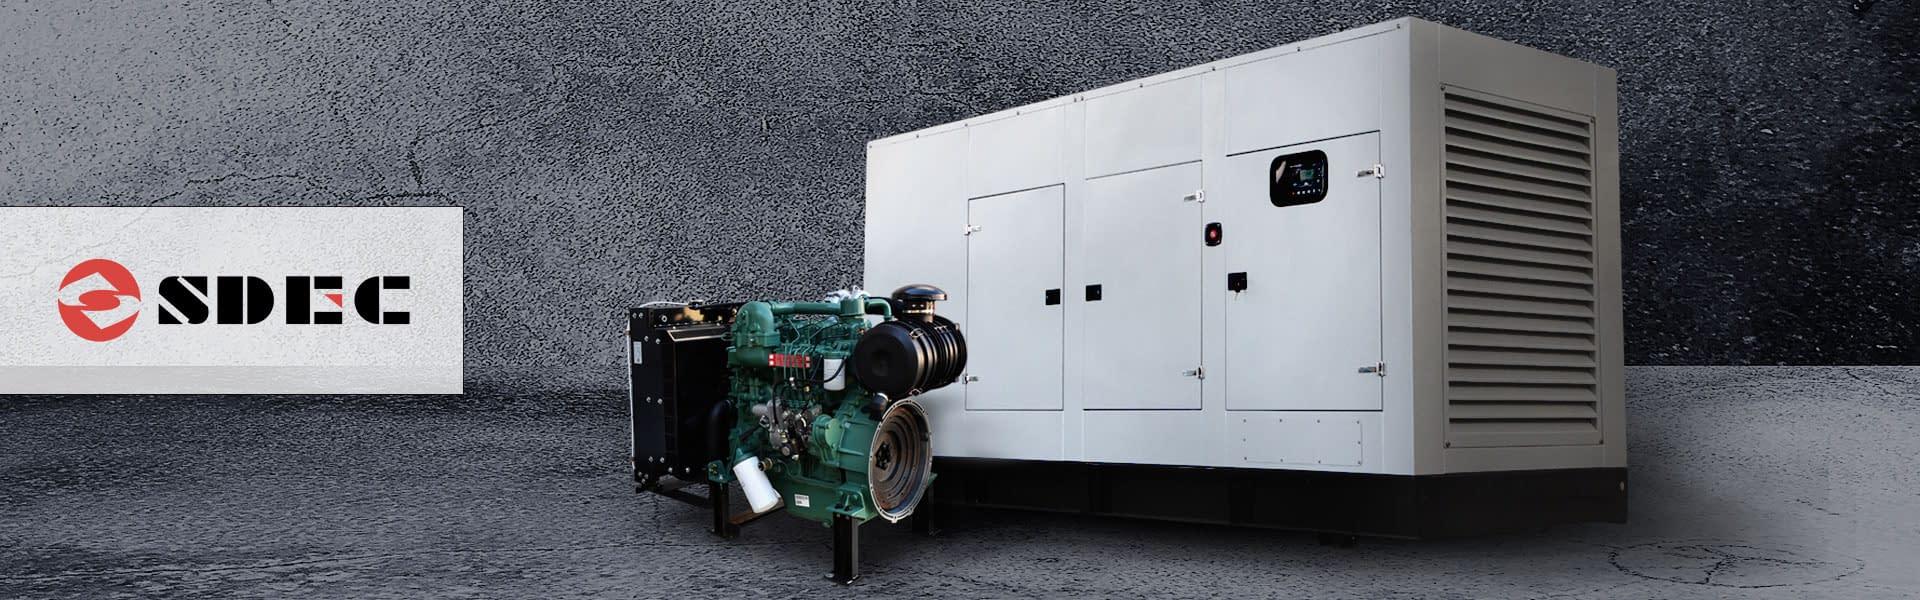 SDEC Diesel Generator for Sale | SDEC Generator South Africa | Generator King